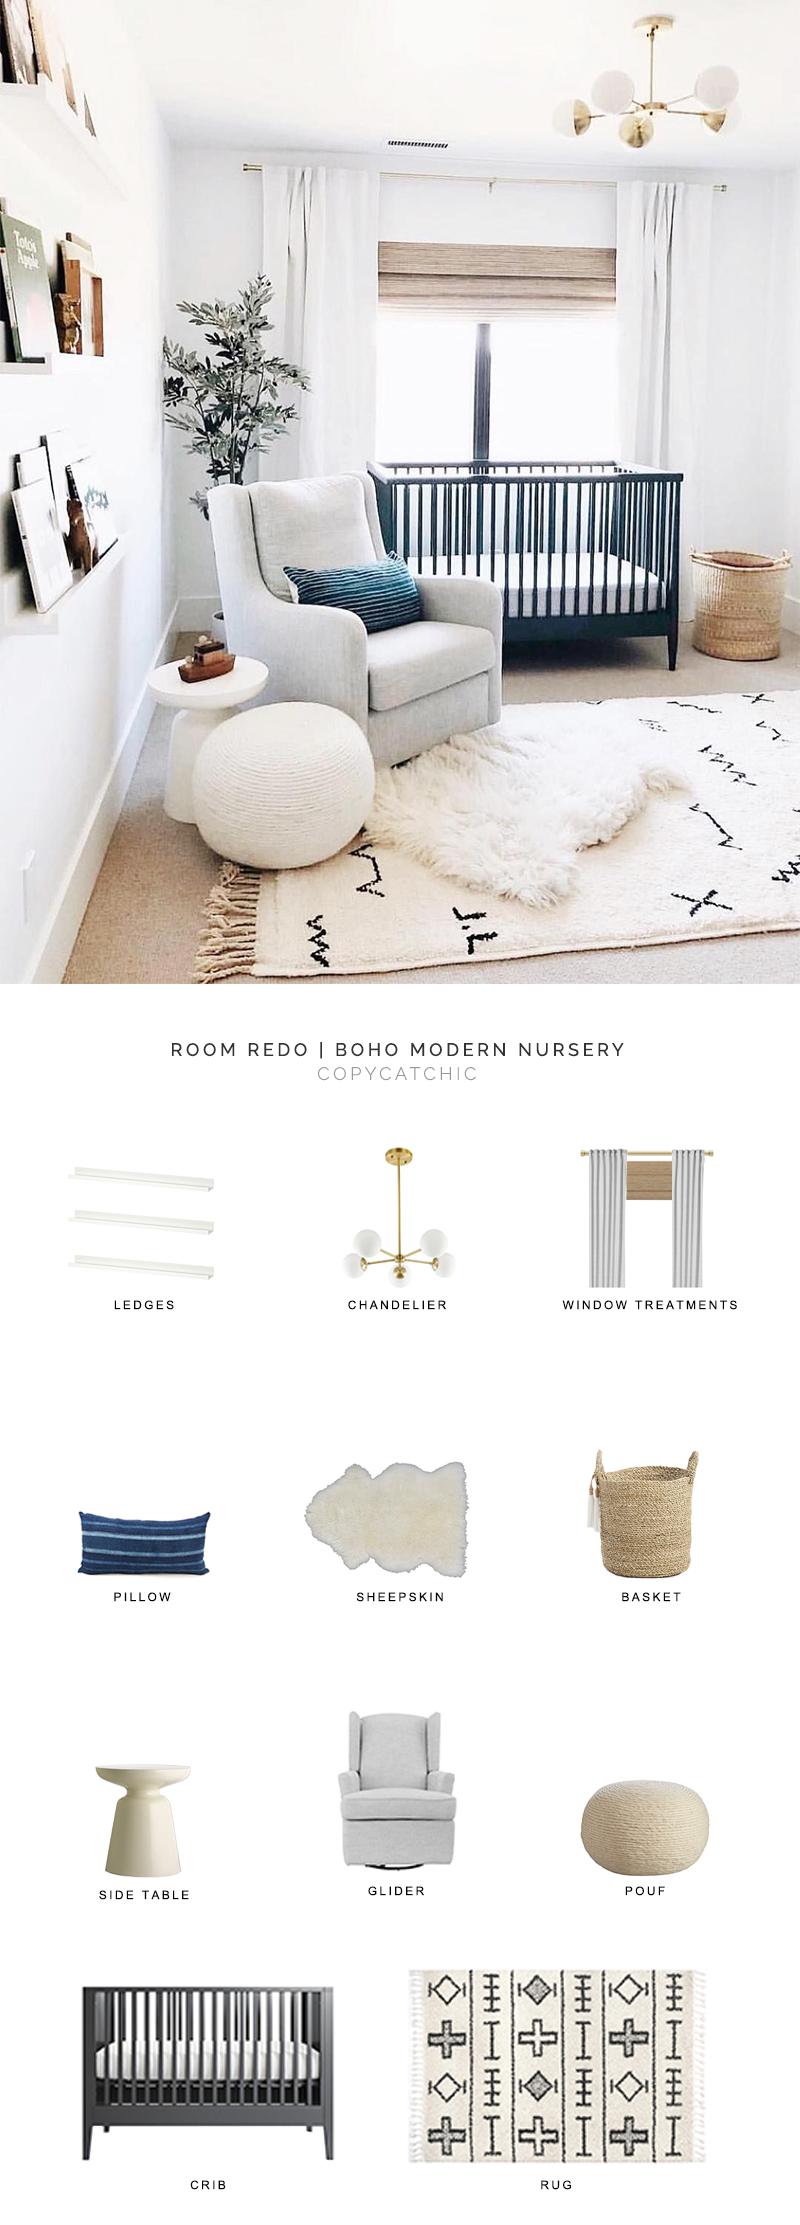 Room Redo | Boho Modern Nursery - copycatchic